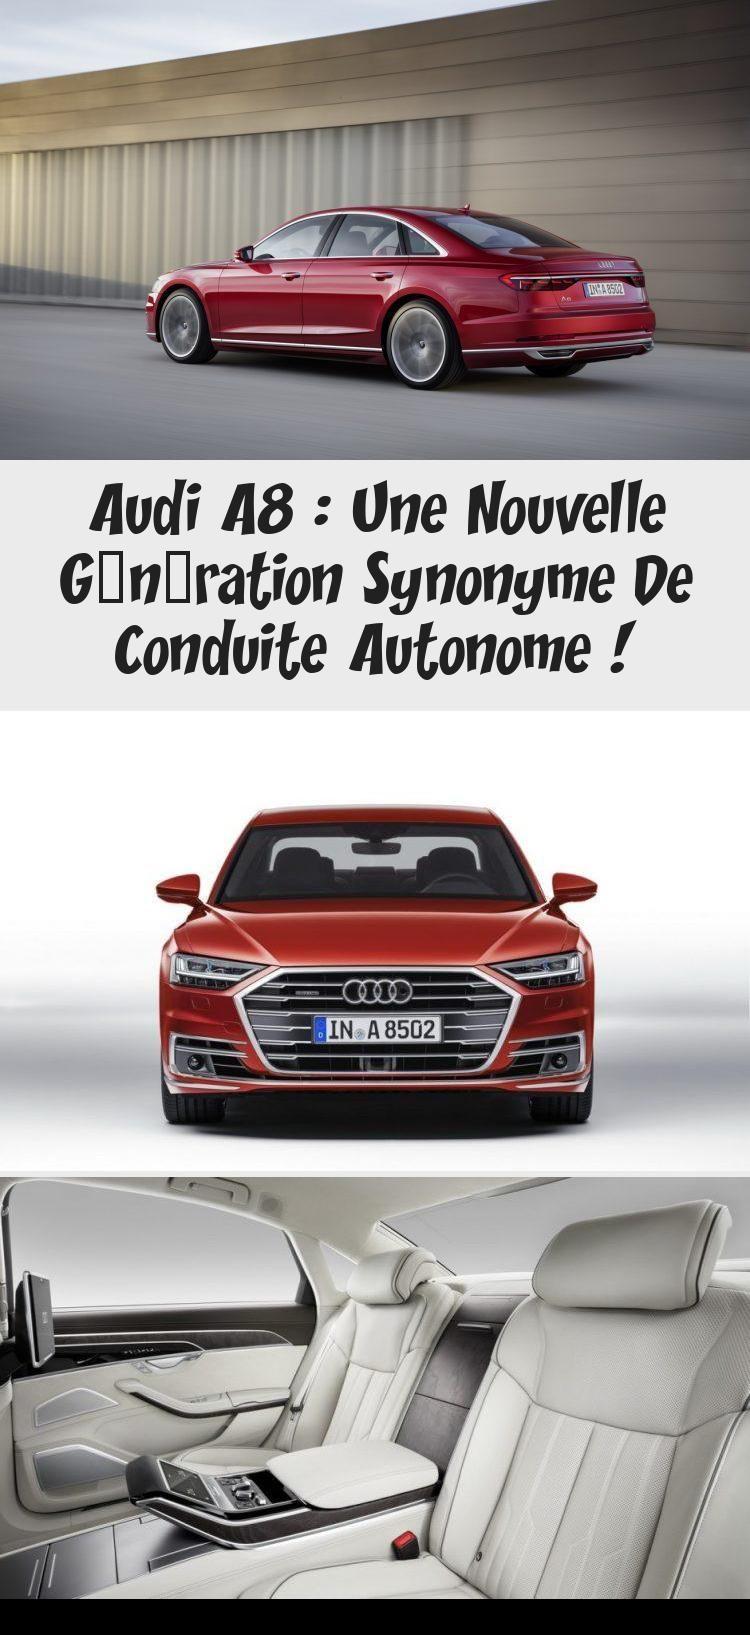 Audiaccessories Audir10 Audiwallpaperiphone Audivoiture Audittmk1 In 2020 Audi A8 Audi Audi Accessories